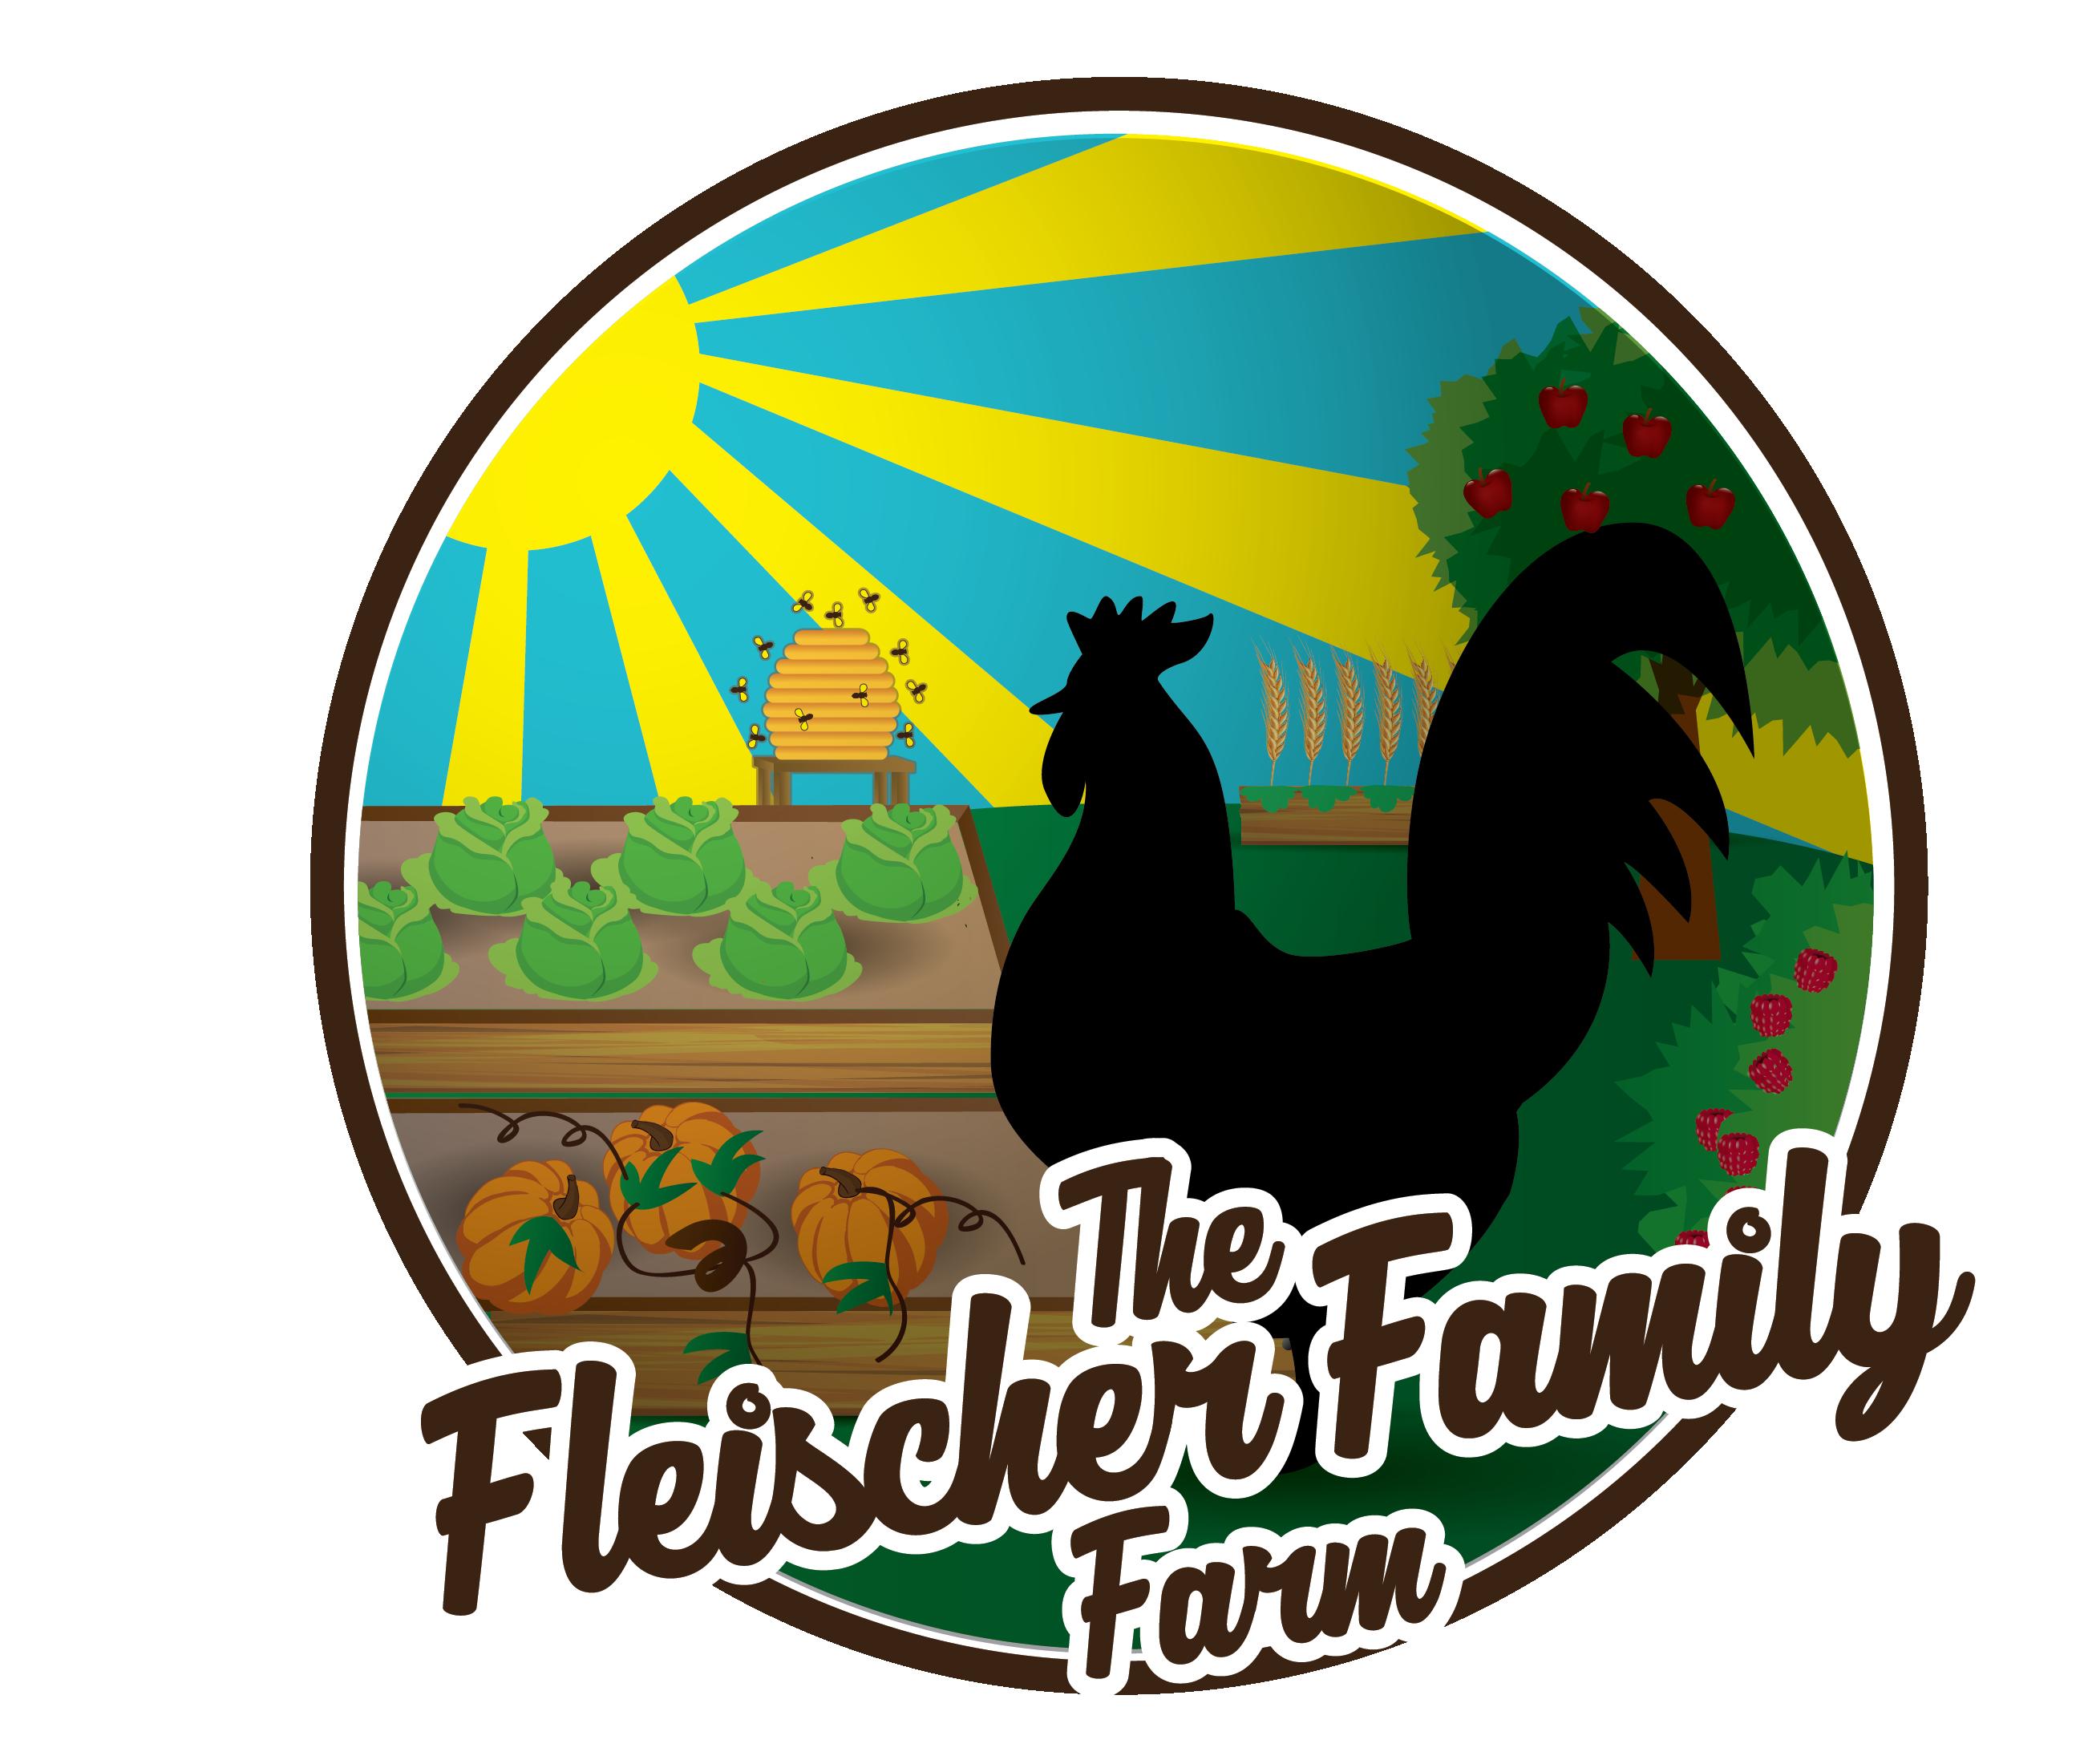 On the farm fleischer. Tired clipart farmer